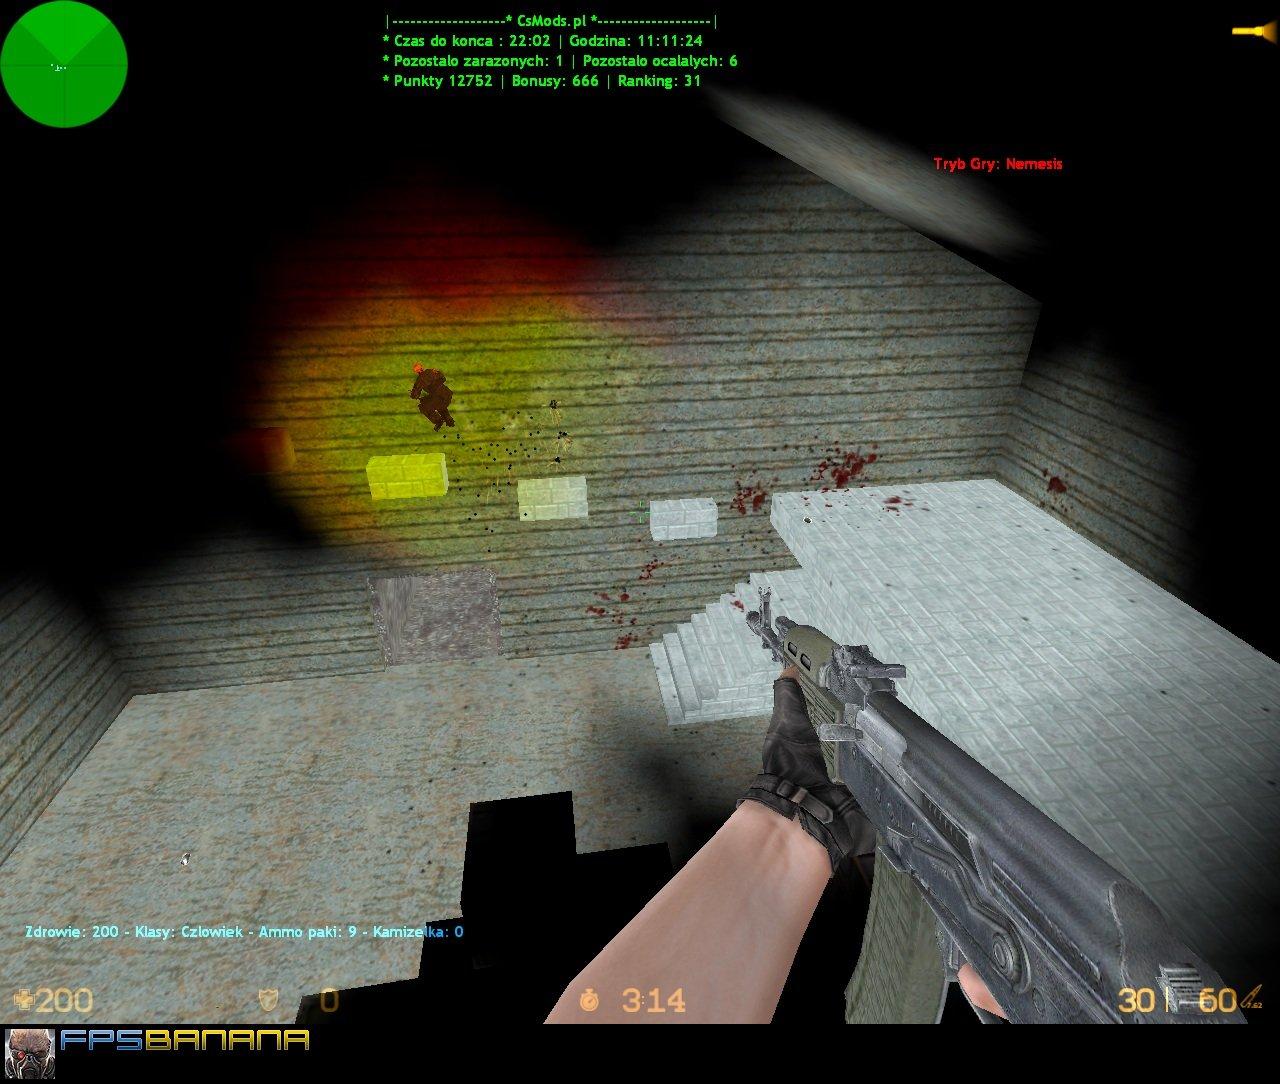 Zm_lost_town (counter-strike 16 maps zombie mod) - gamebanana